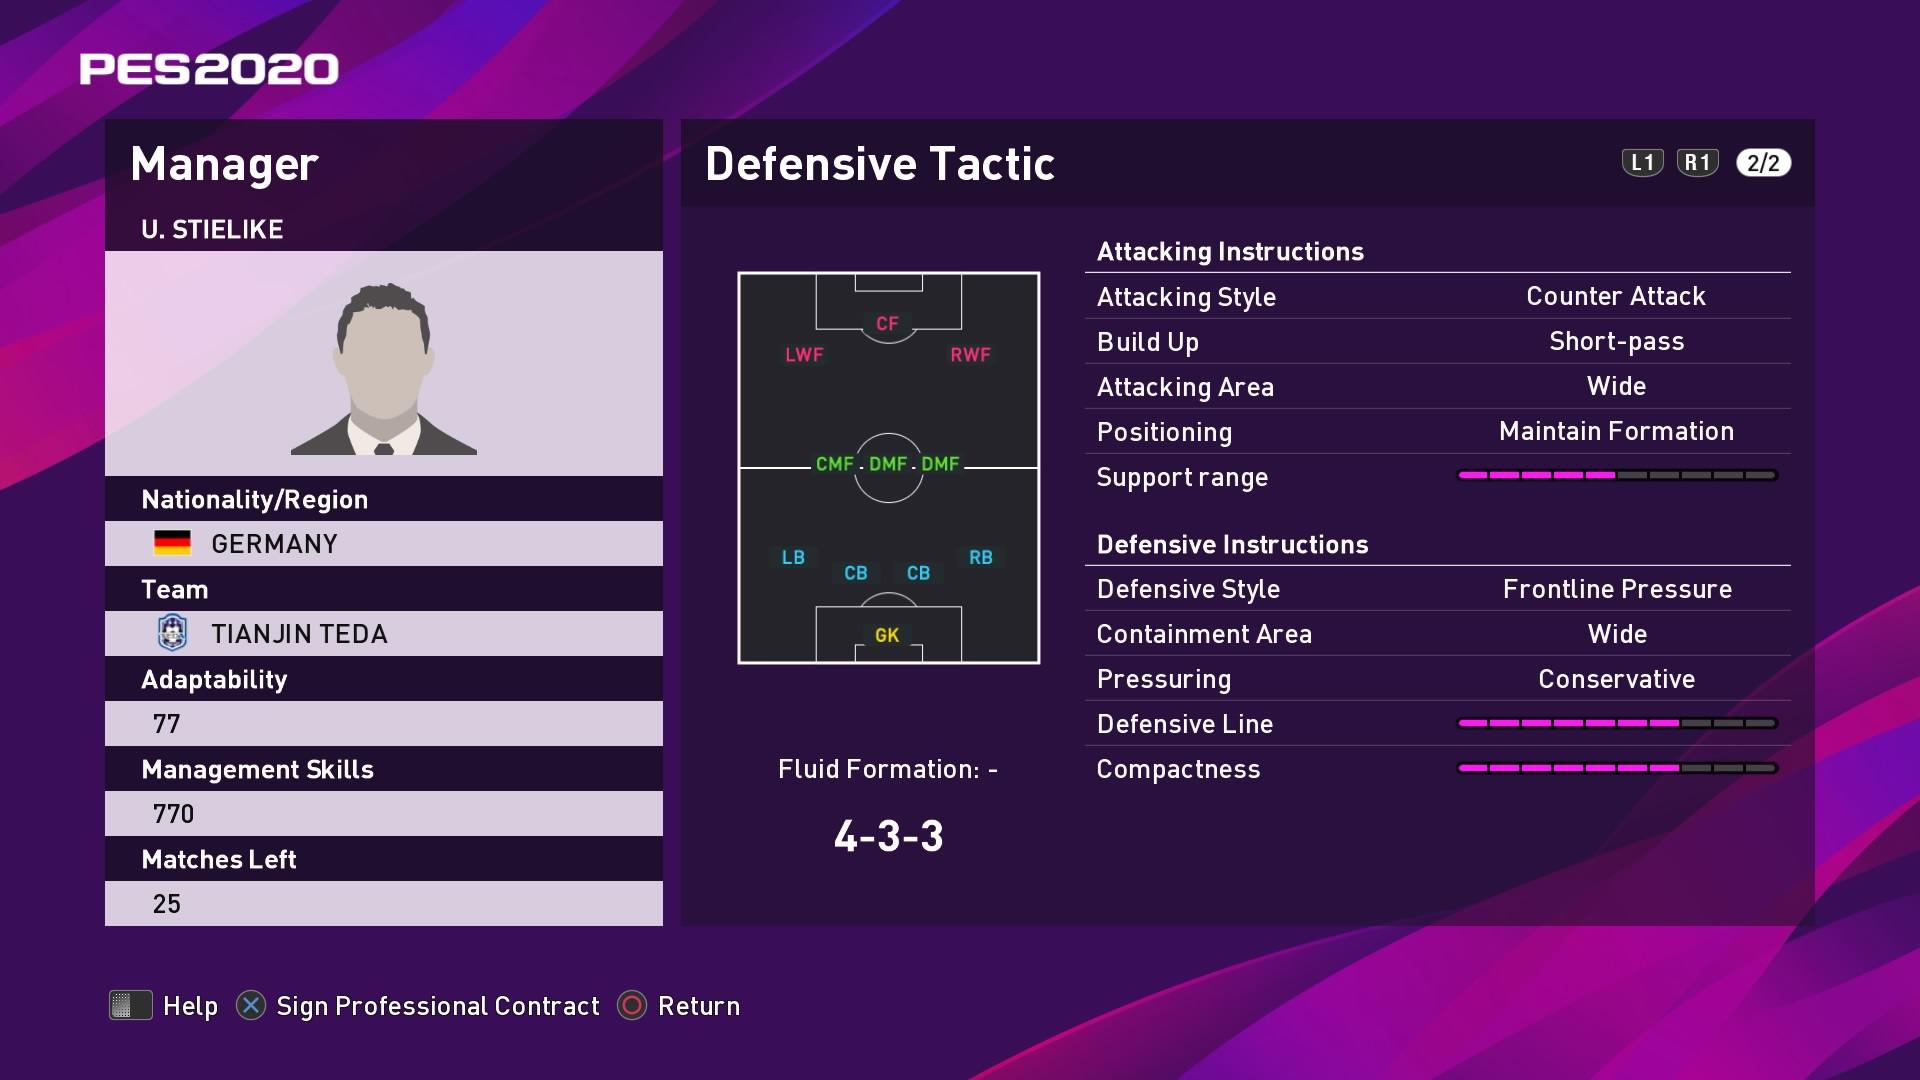 U. Stielike (Uli Stielike) Defensive Tactic in PES 2020 myClub